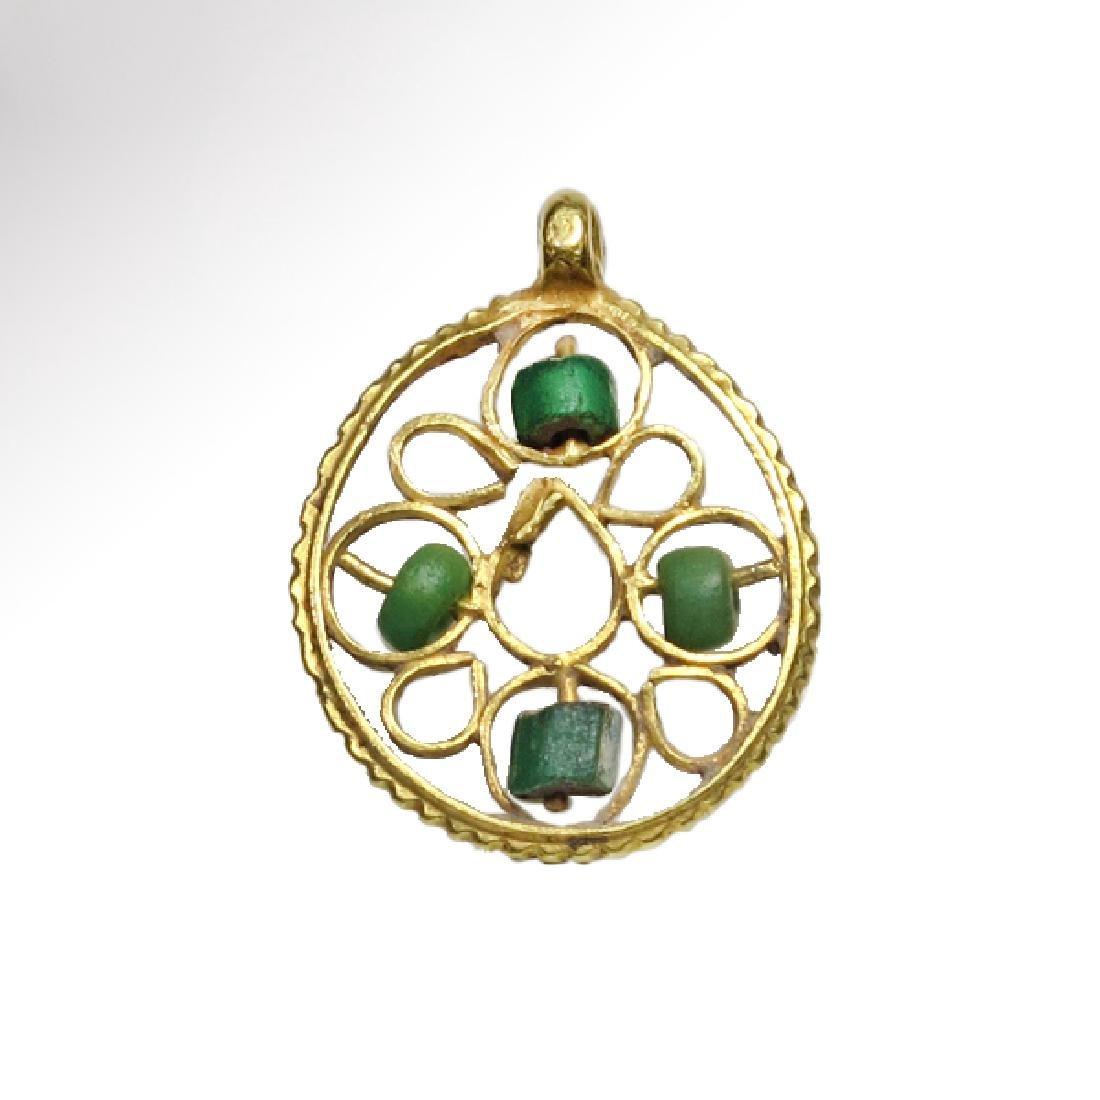 Byzantine Gold Pendant with Rosette Cross